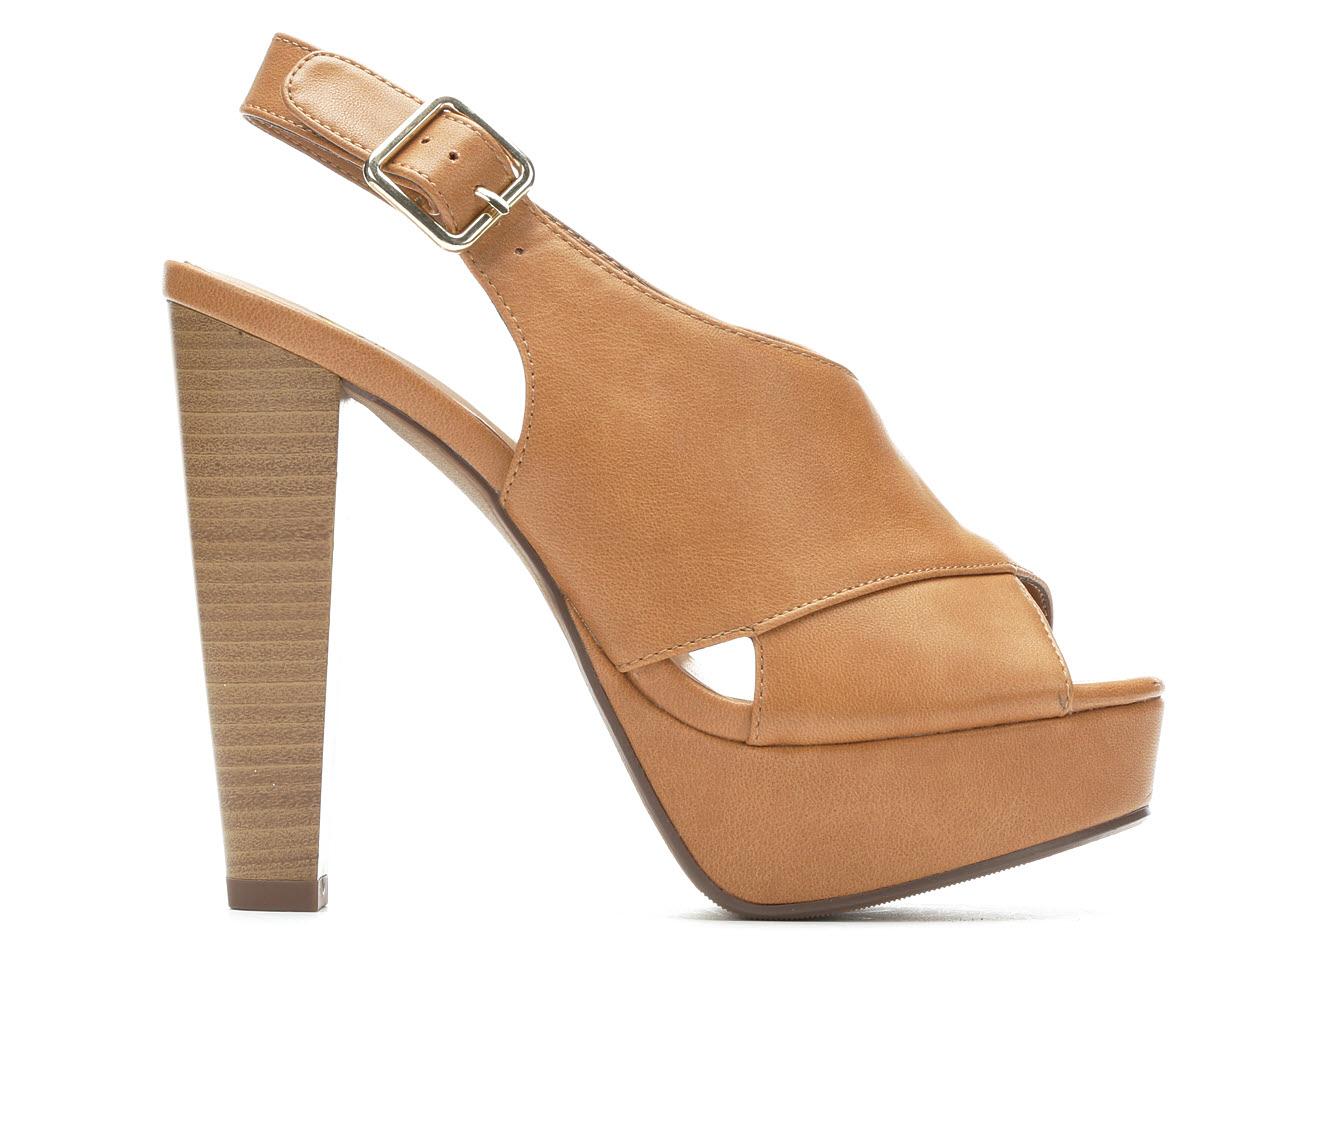 Delicious Hab Women's Dress Shoe (Brown Faux Leather)